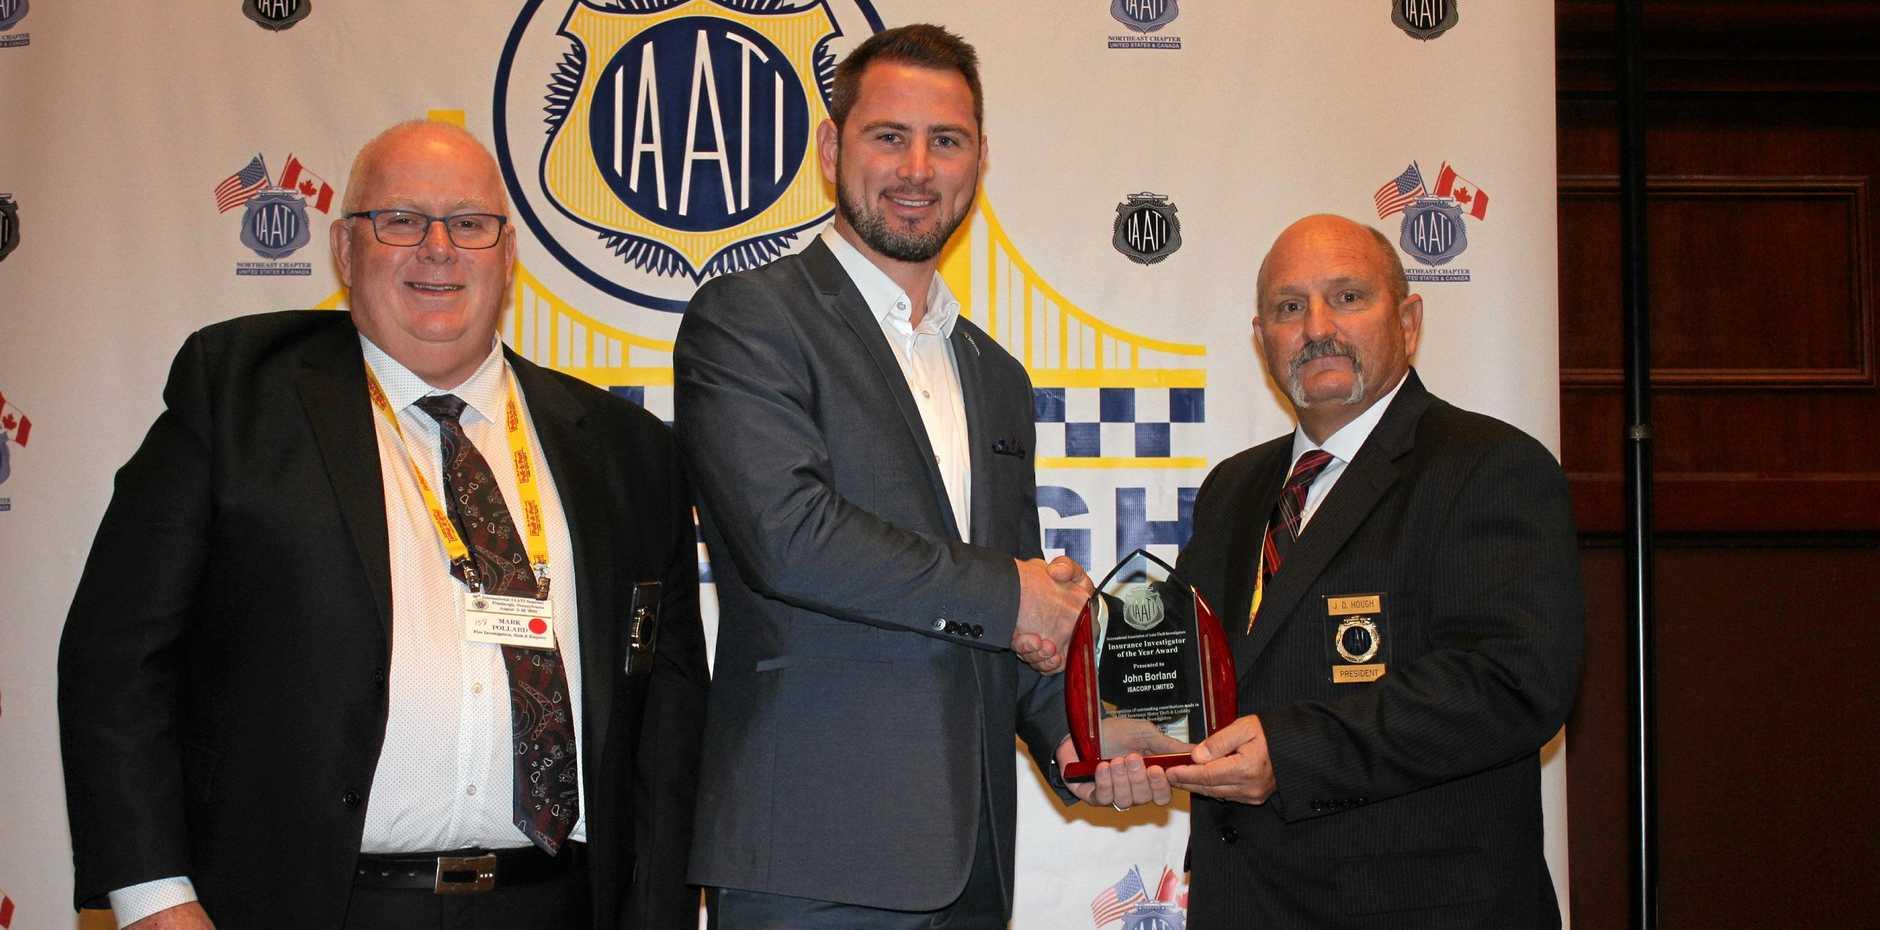 MAKING STRIDES: John Borland receiving his world award.